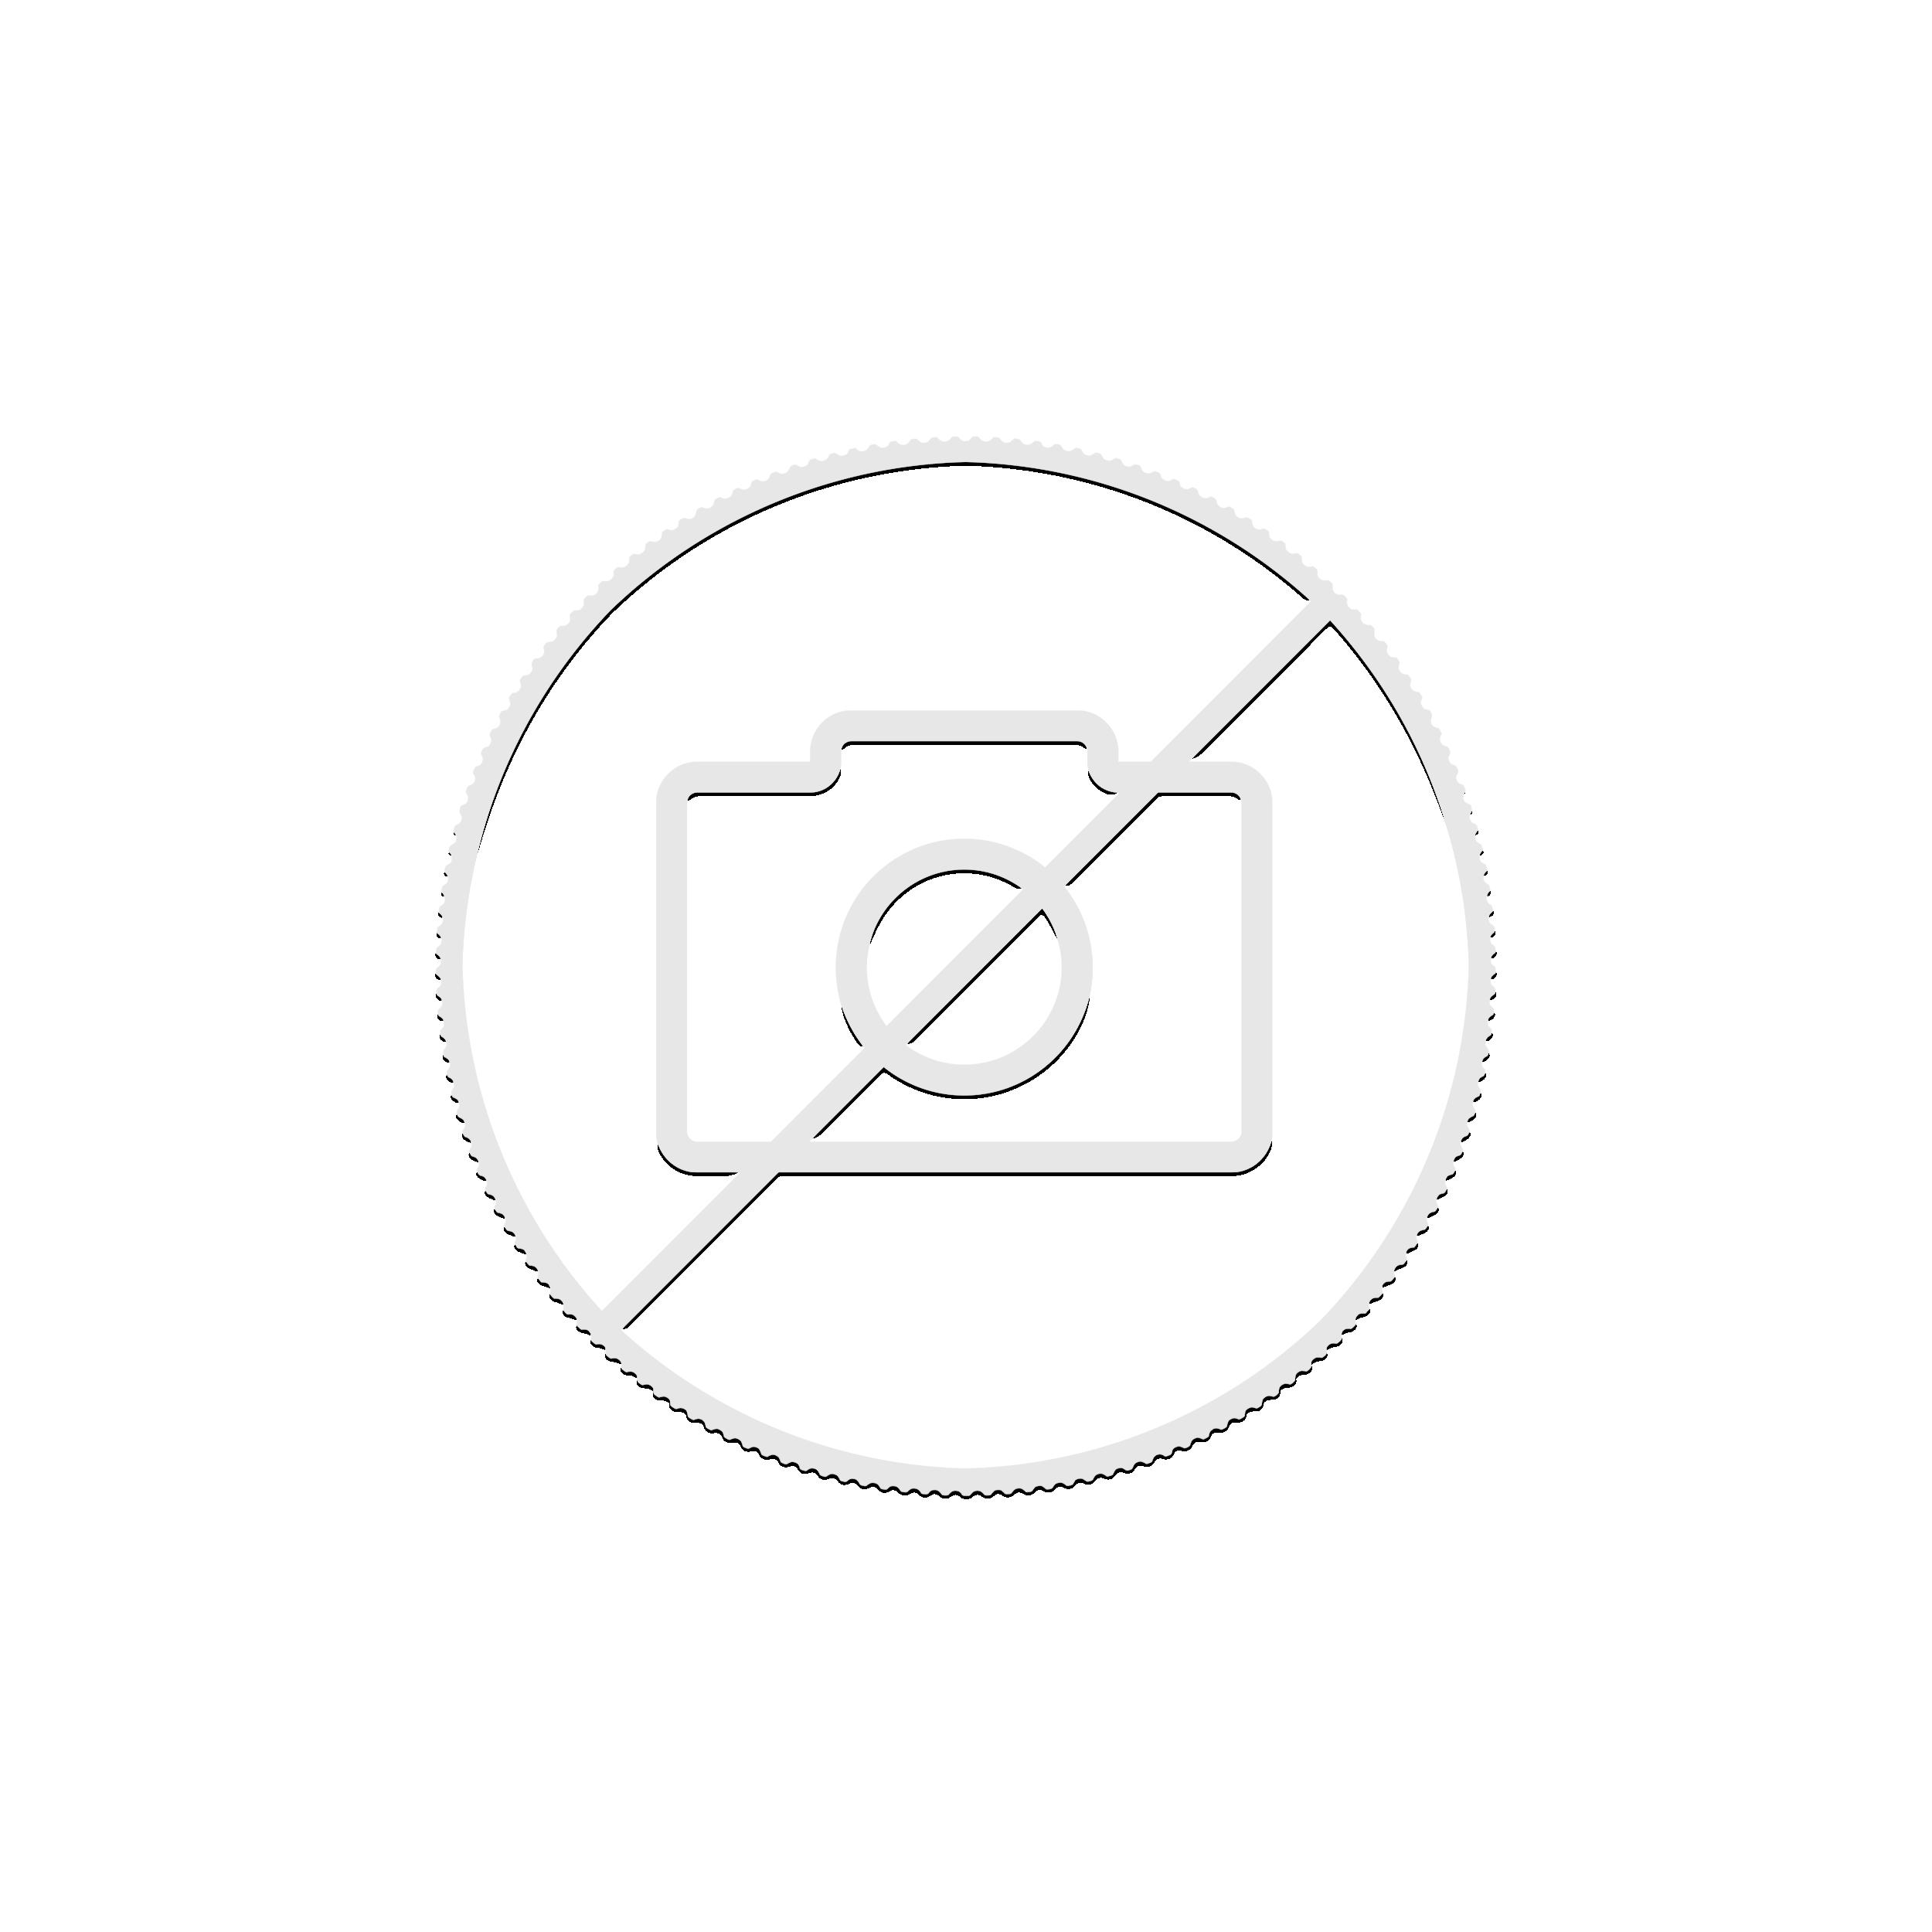 1 troy ounce gold bar Sunshine Mint